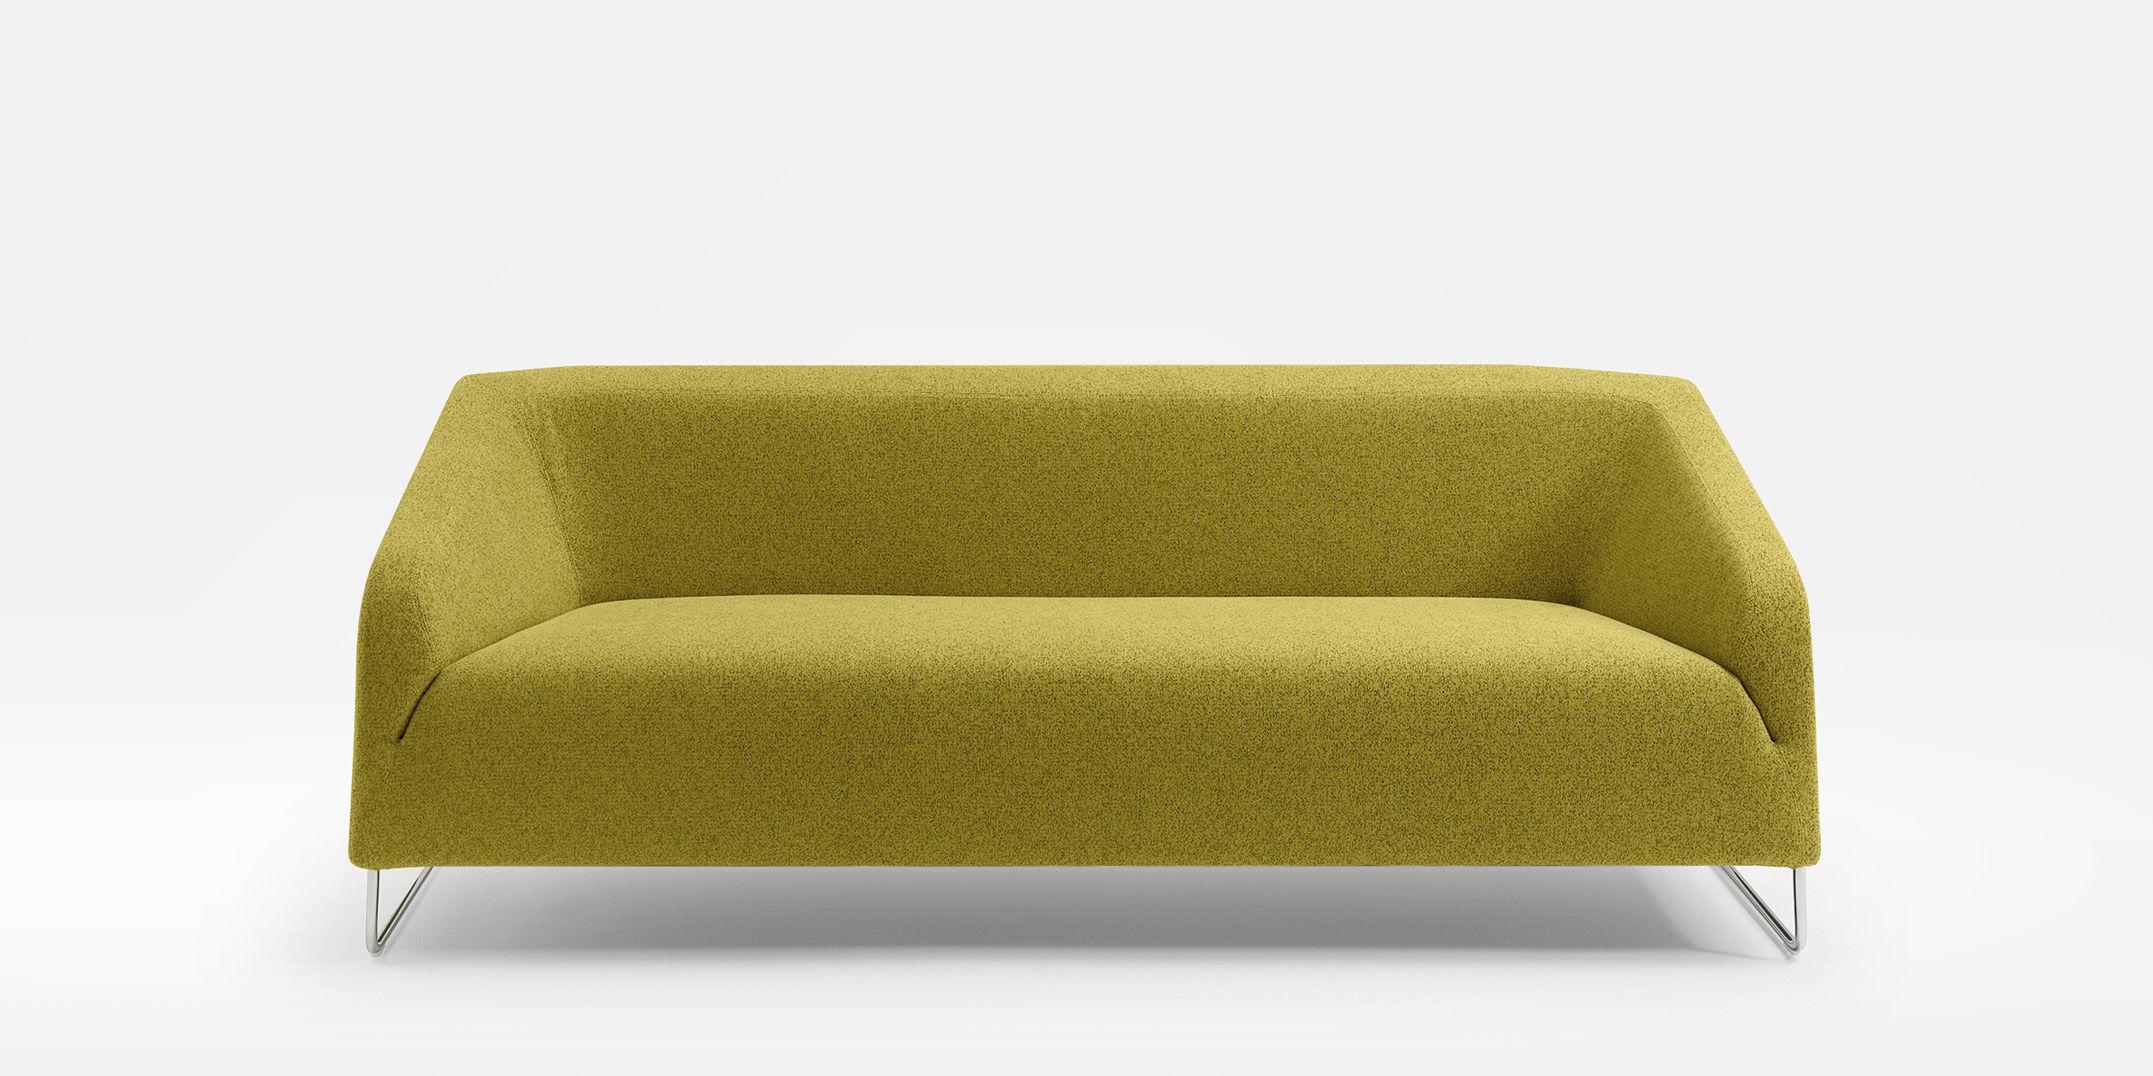 Stupendous Compact Sofa Contemporary Leather Fabric Diva By Machost Co Dining Chair Design Ideas Machostcouk